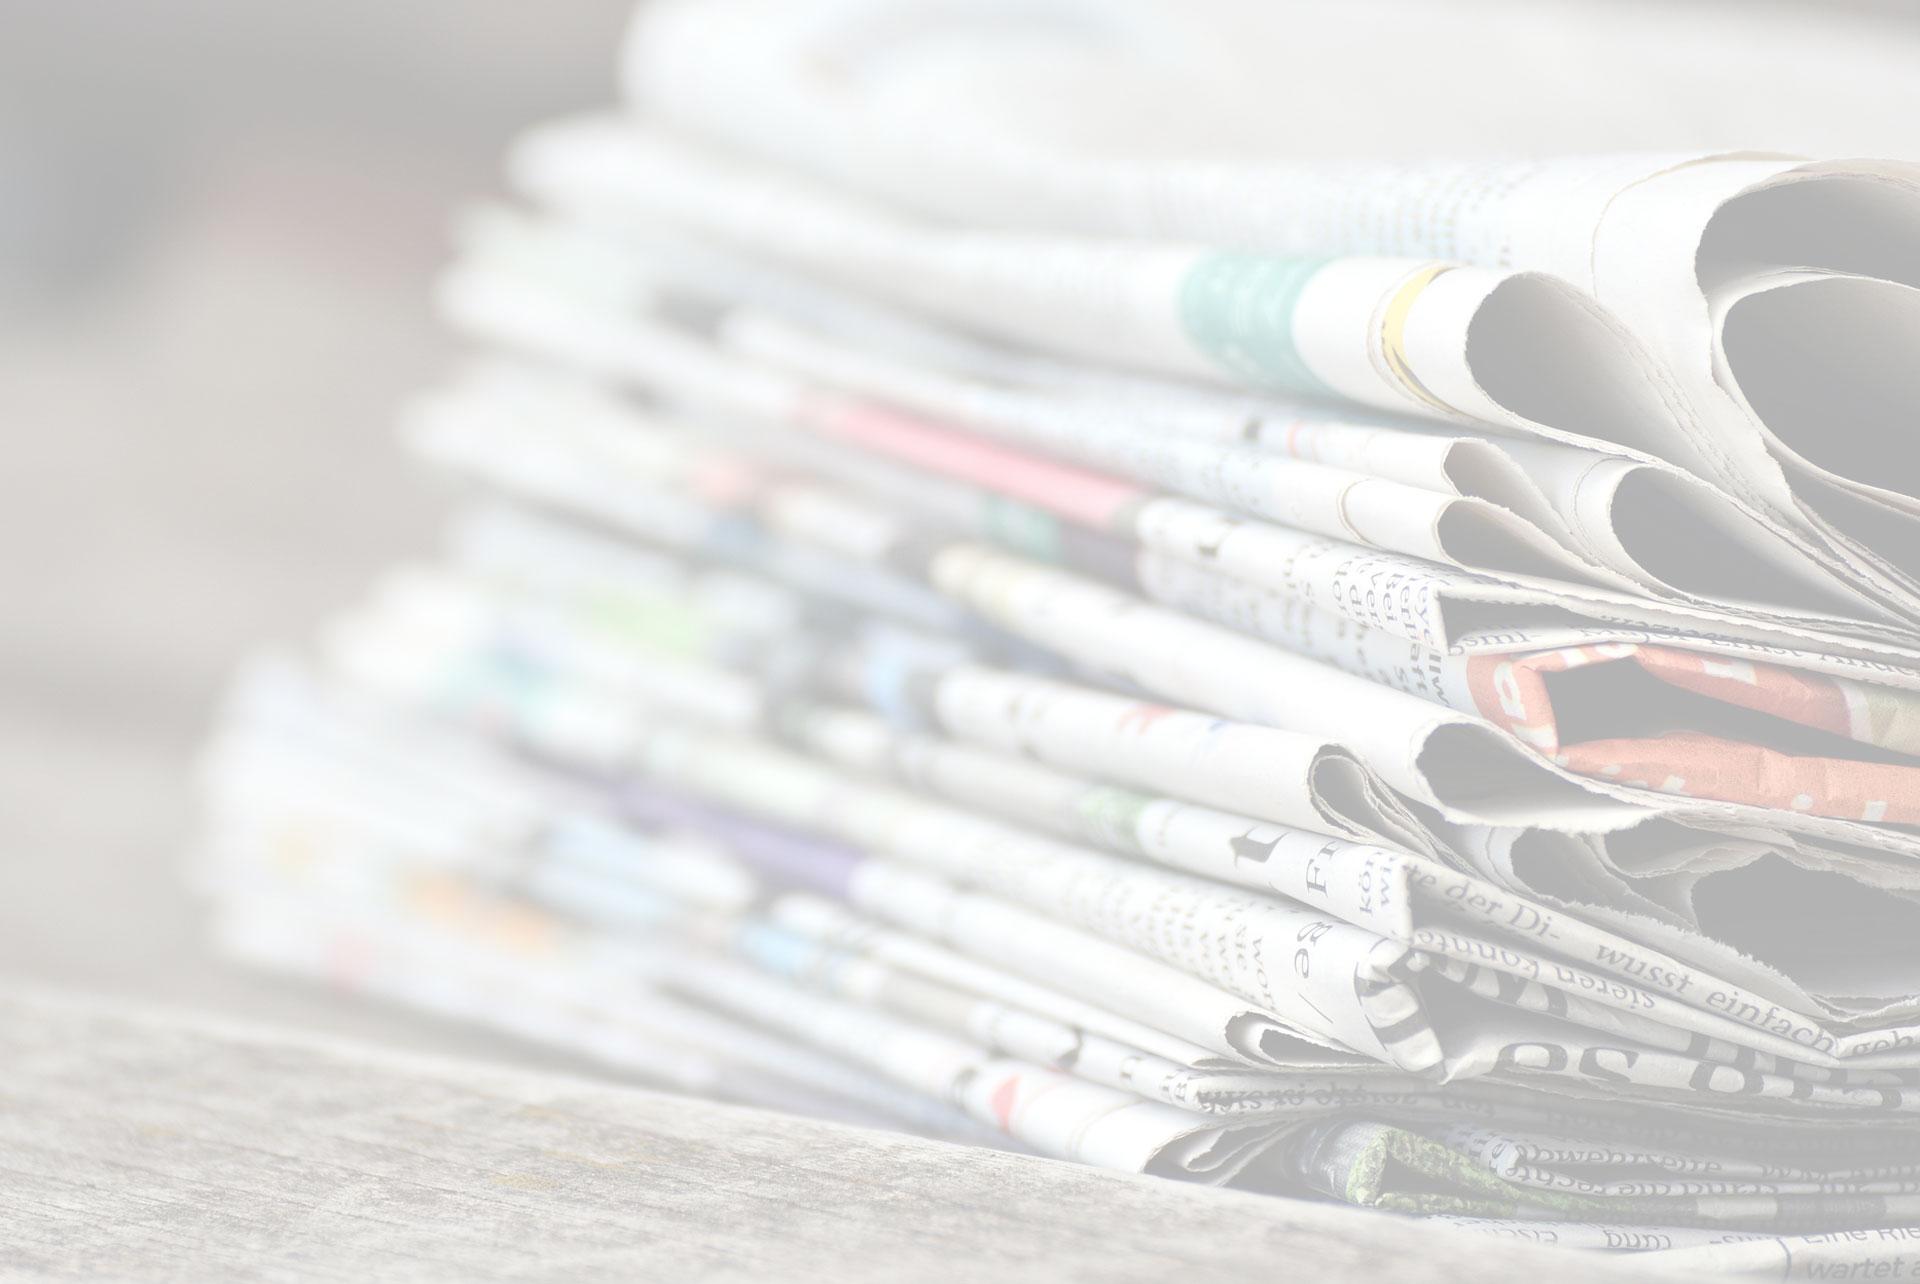 Cile, Santiago